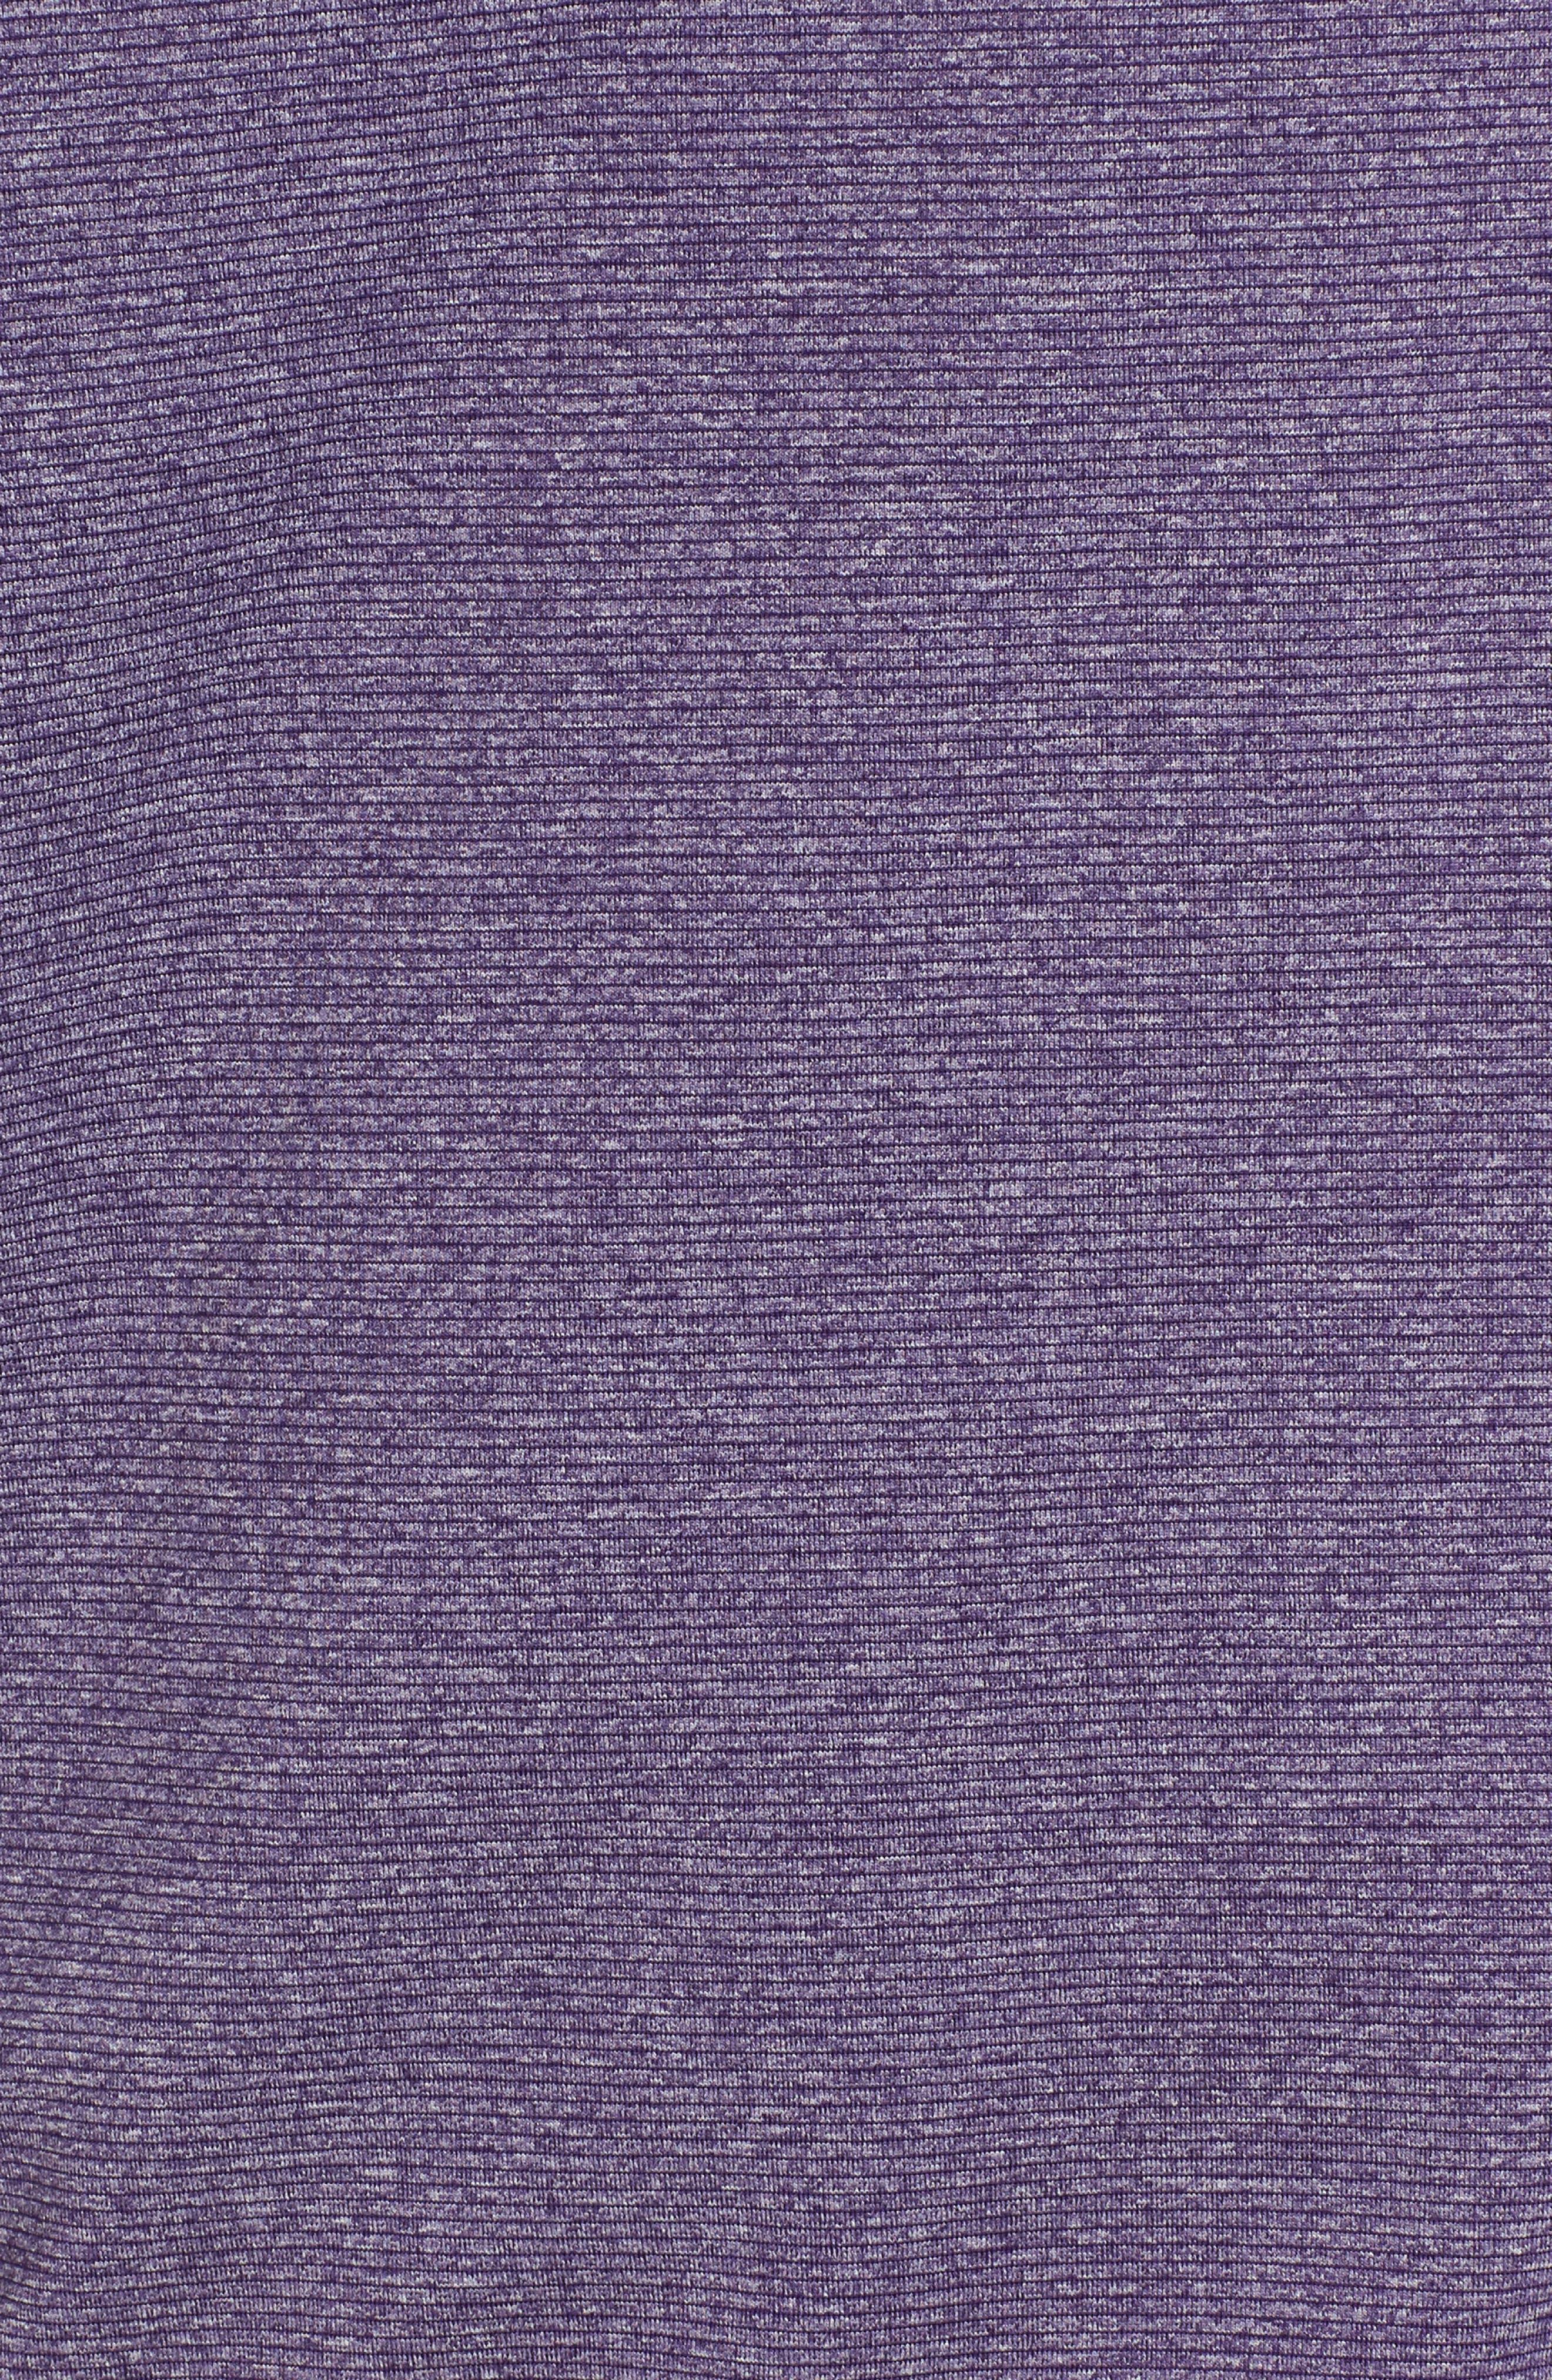 Shoreline - Baltimore Ravens Half Zip Pullover,                             Alternate thumbnail 5, color,                             College Purple Heather